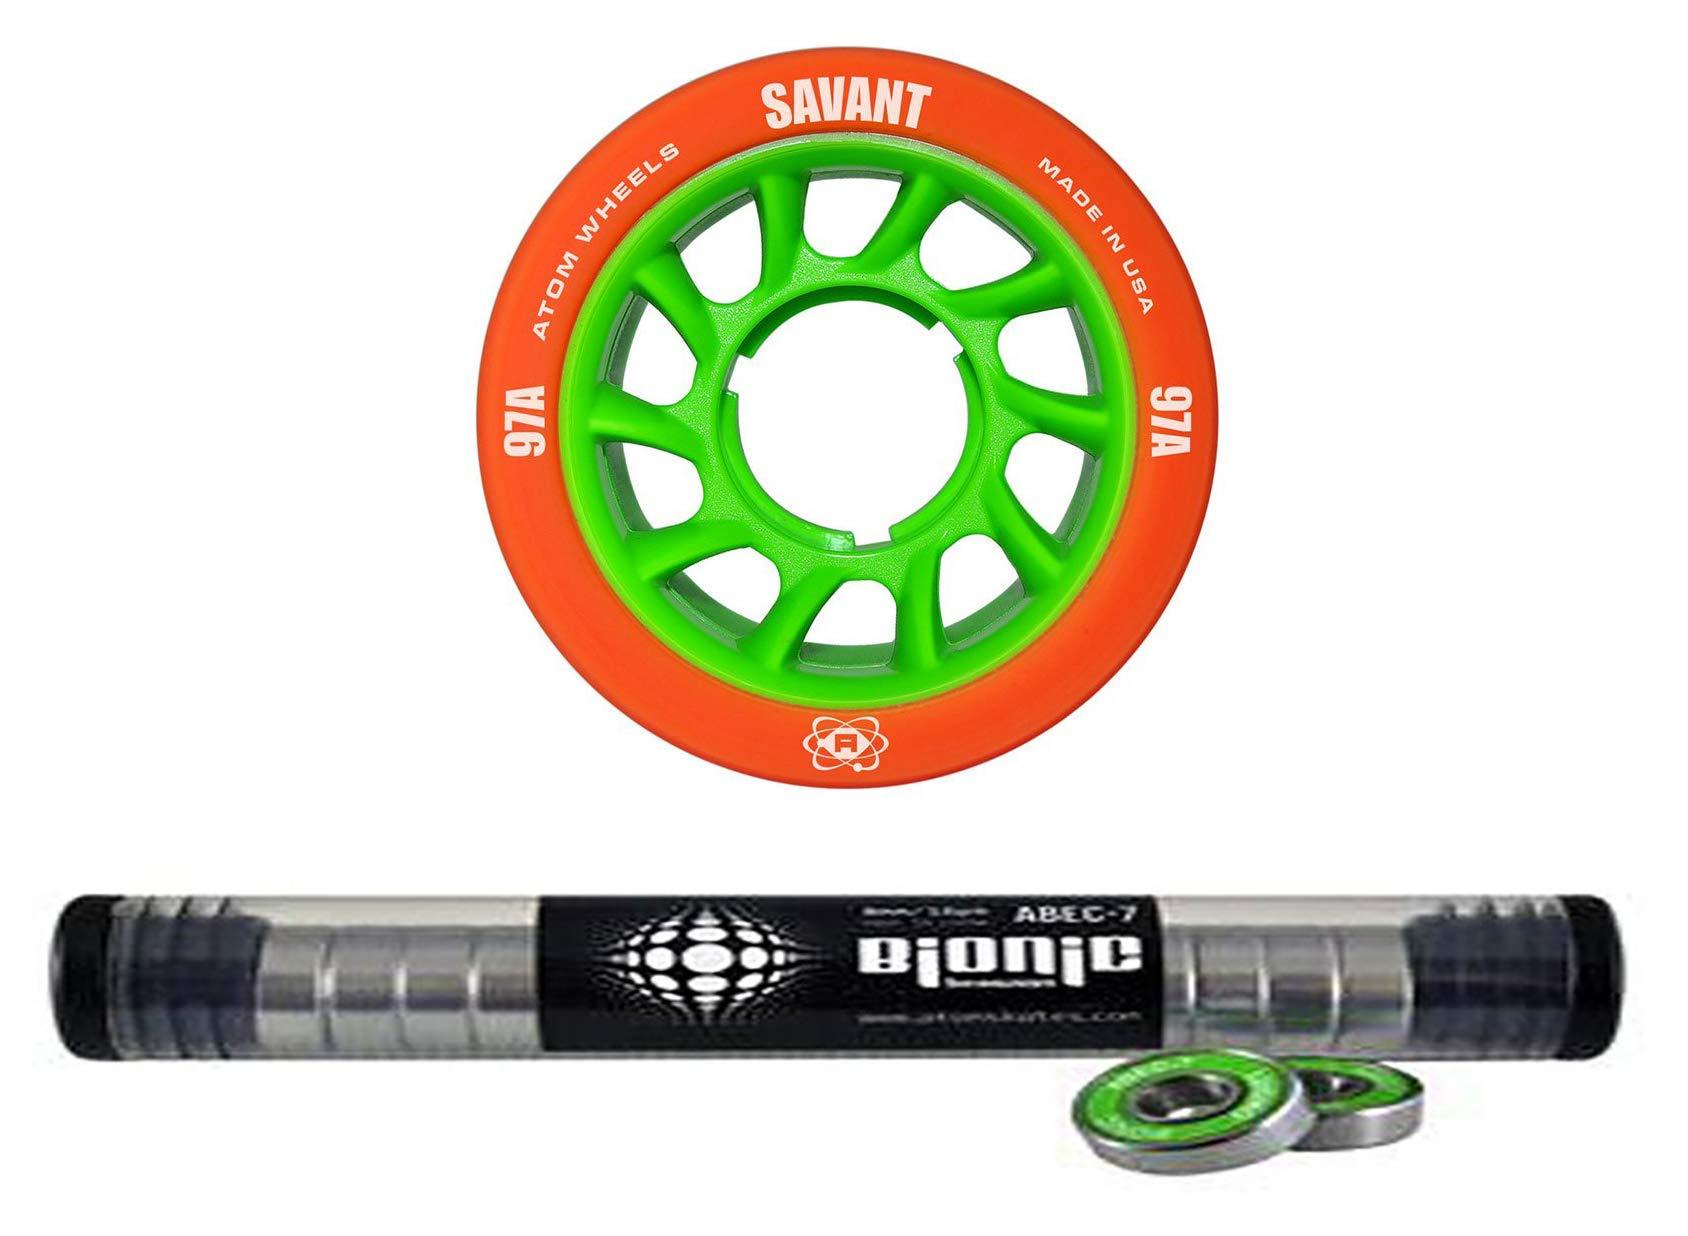 Atom Savant Skate Wheels with Bionic Bearings 8mm Full Set of 8 Orange 97A by Atom Skates